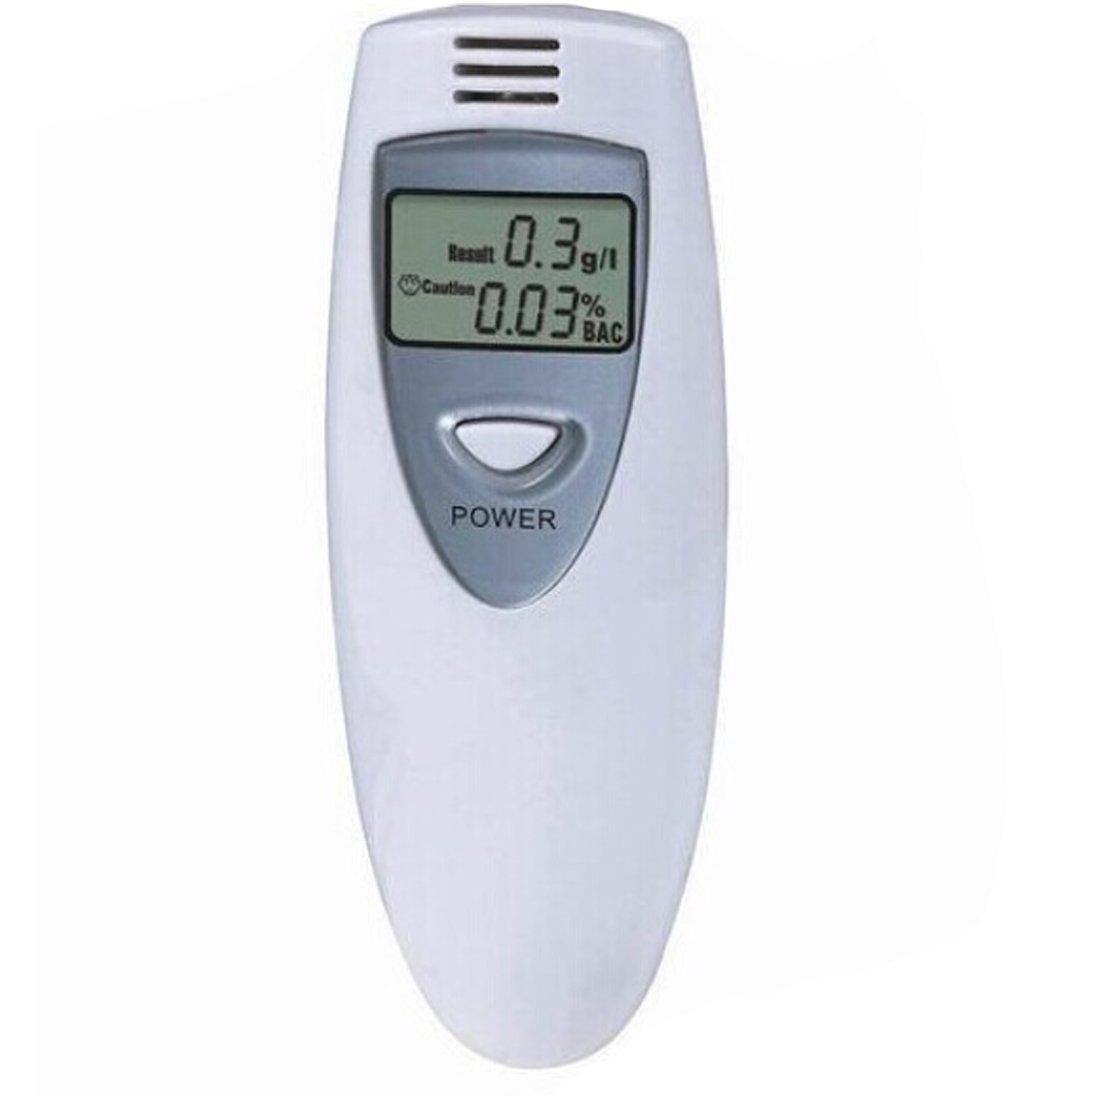 Alcohol/ímetro digital con pantalla LCD y tama/ño de bolsillo